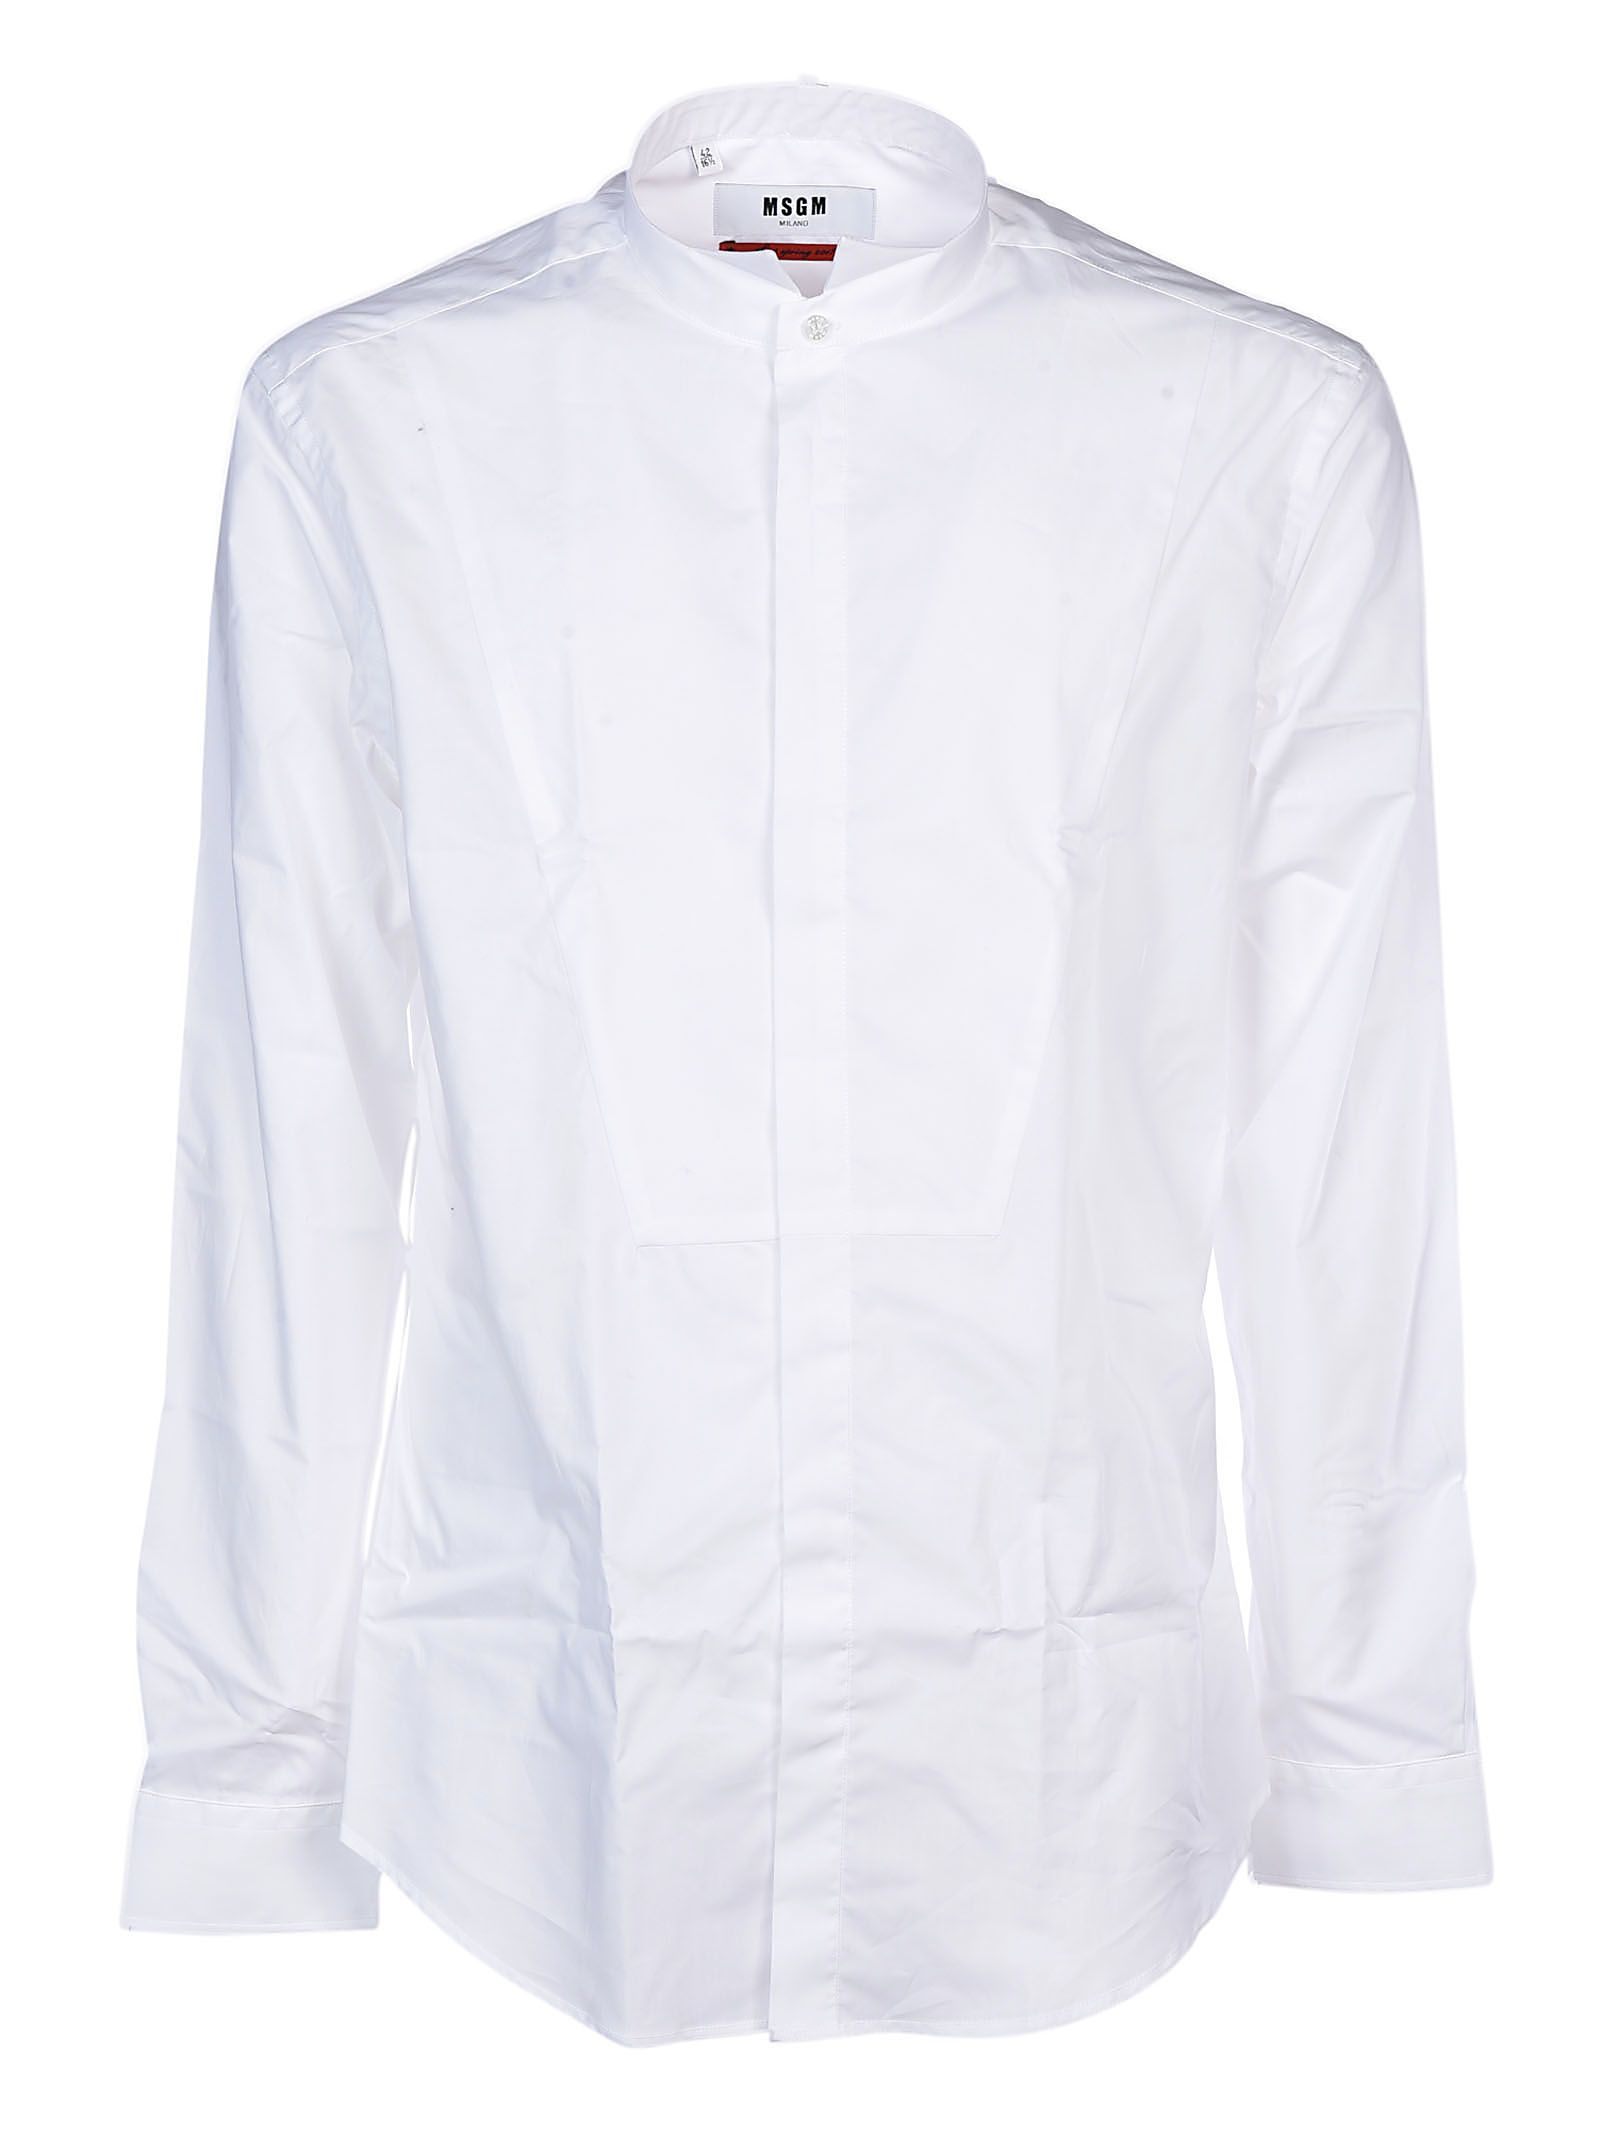 Msgm Classic Shirt